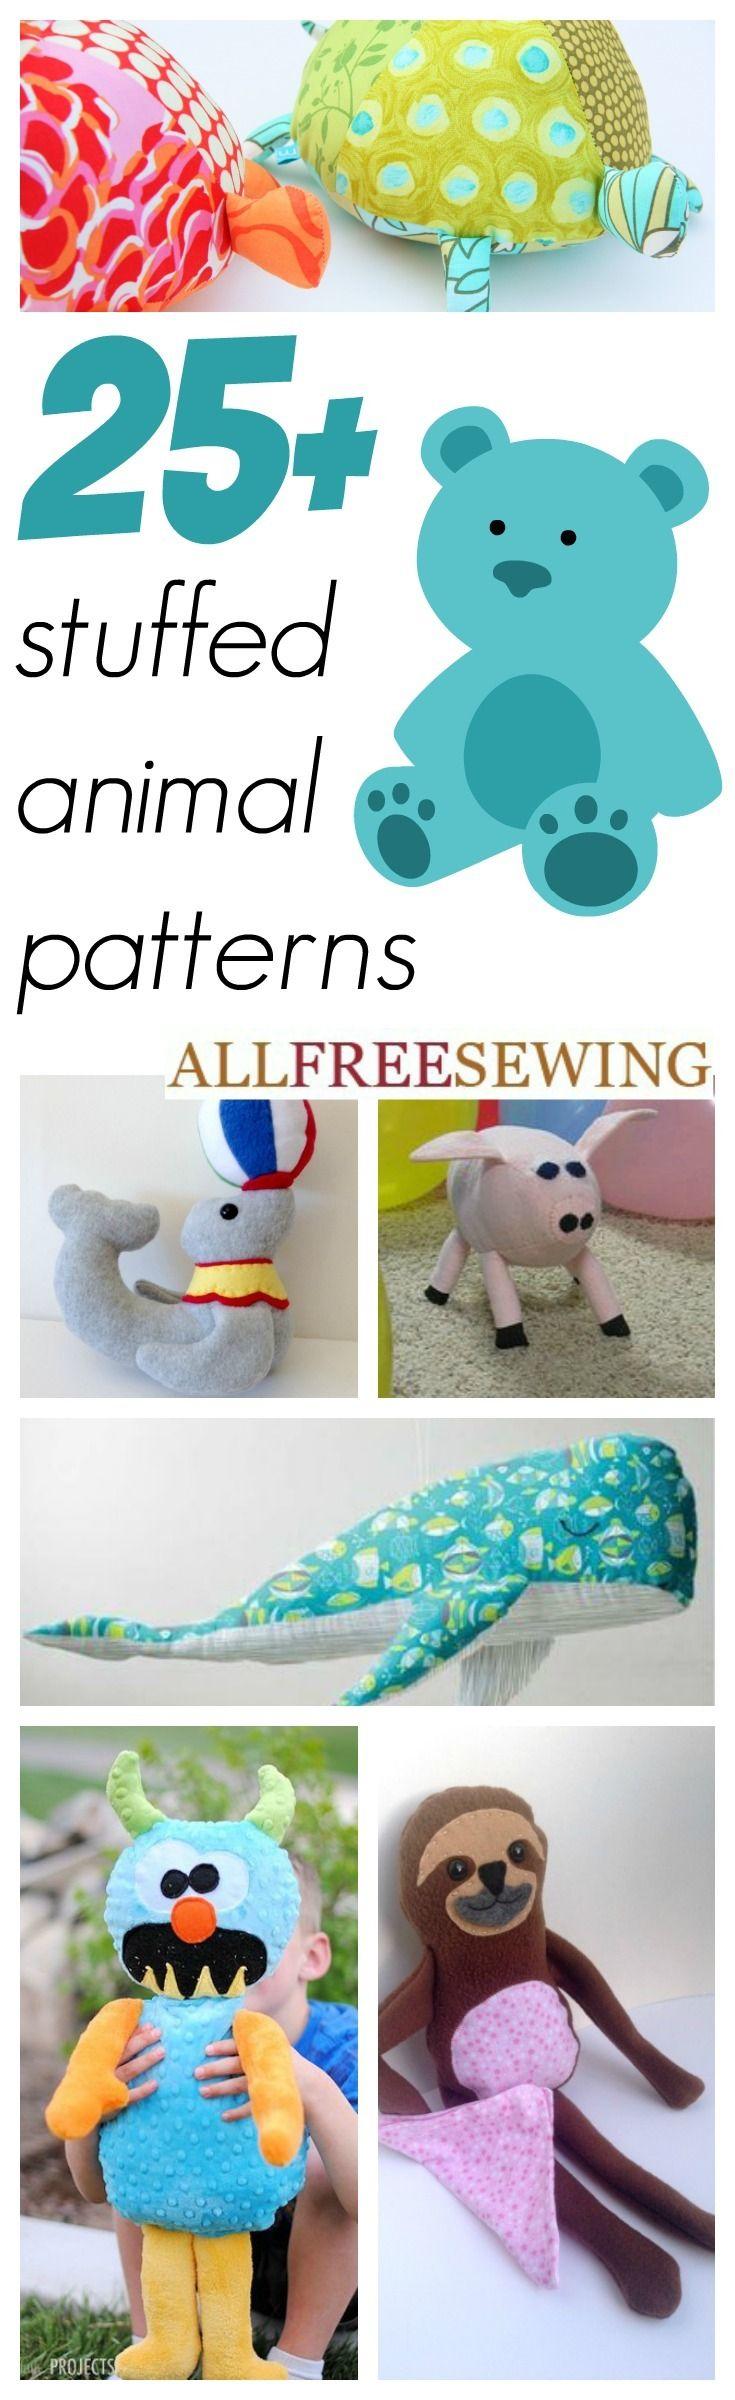 25+ Easy Stuffed Animal Patterns | Animal patterns, Animal and Patterns